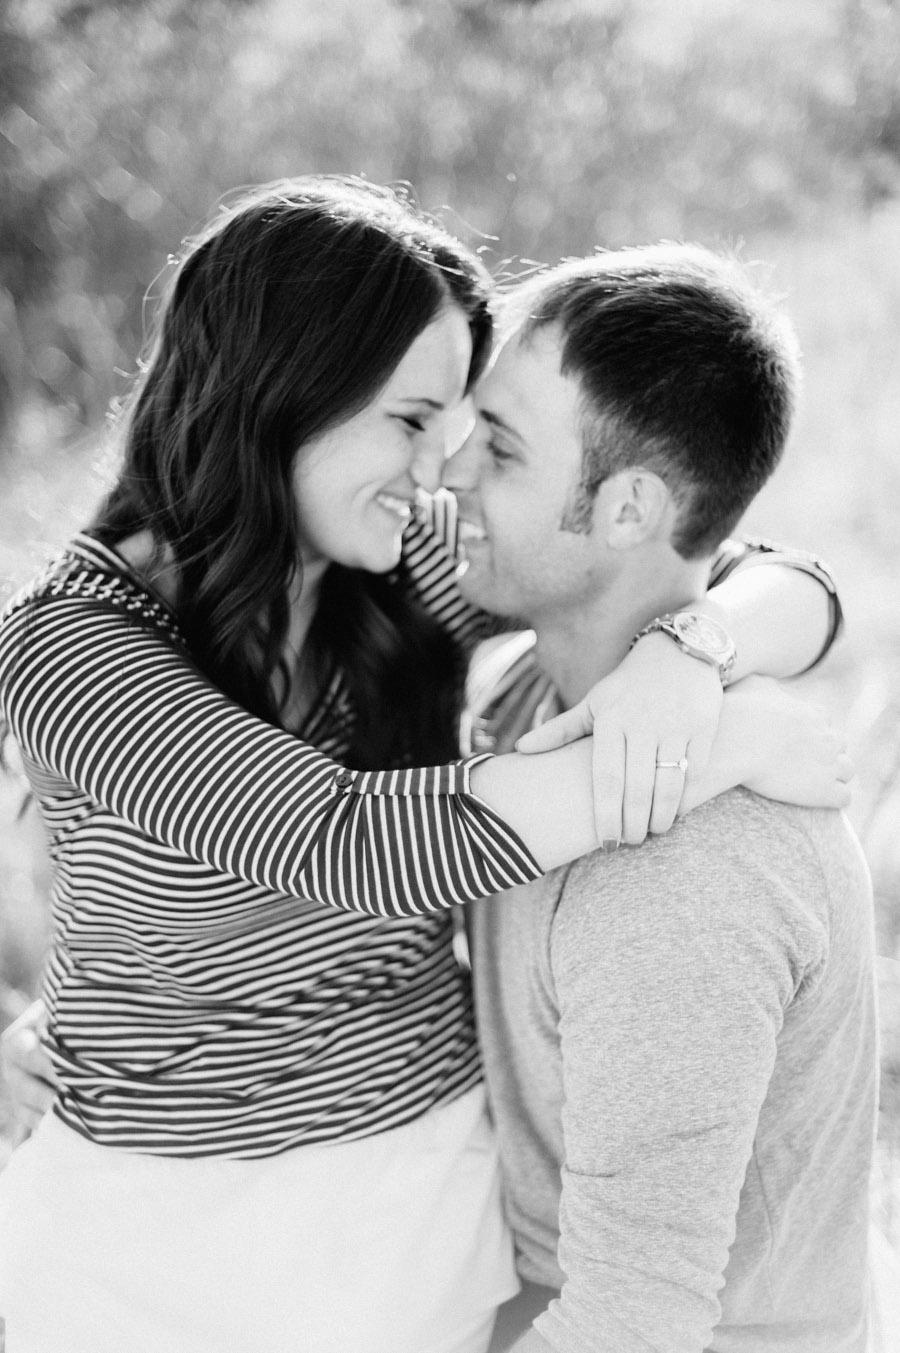 Craig and Erica Engagement-1.jpg